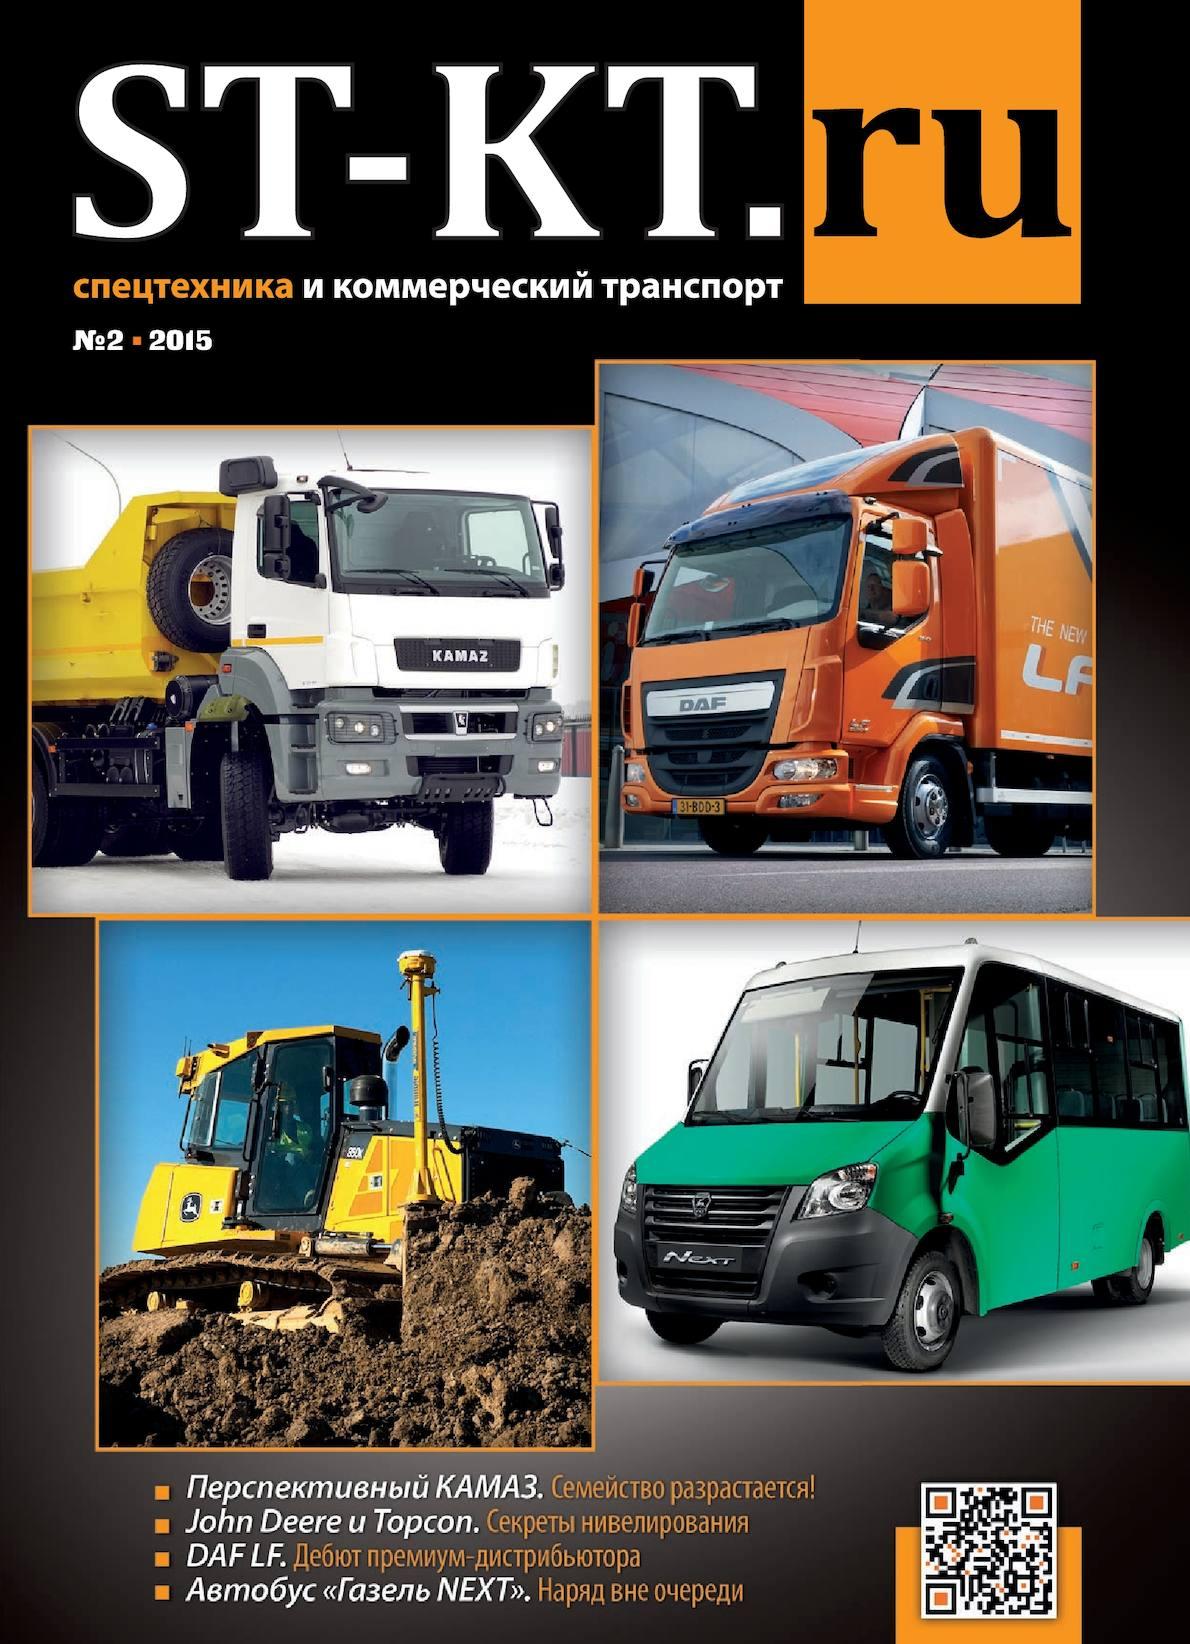 СпецТехника и Коммерческий Транспорт №2/2015